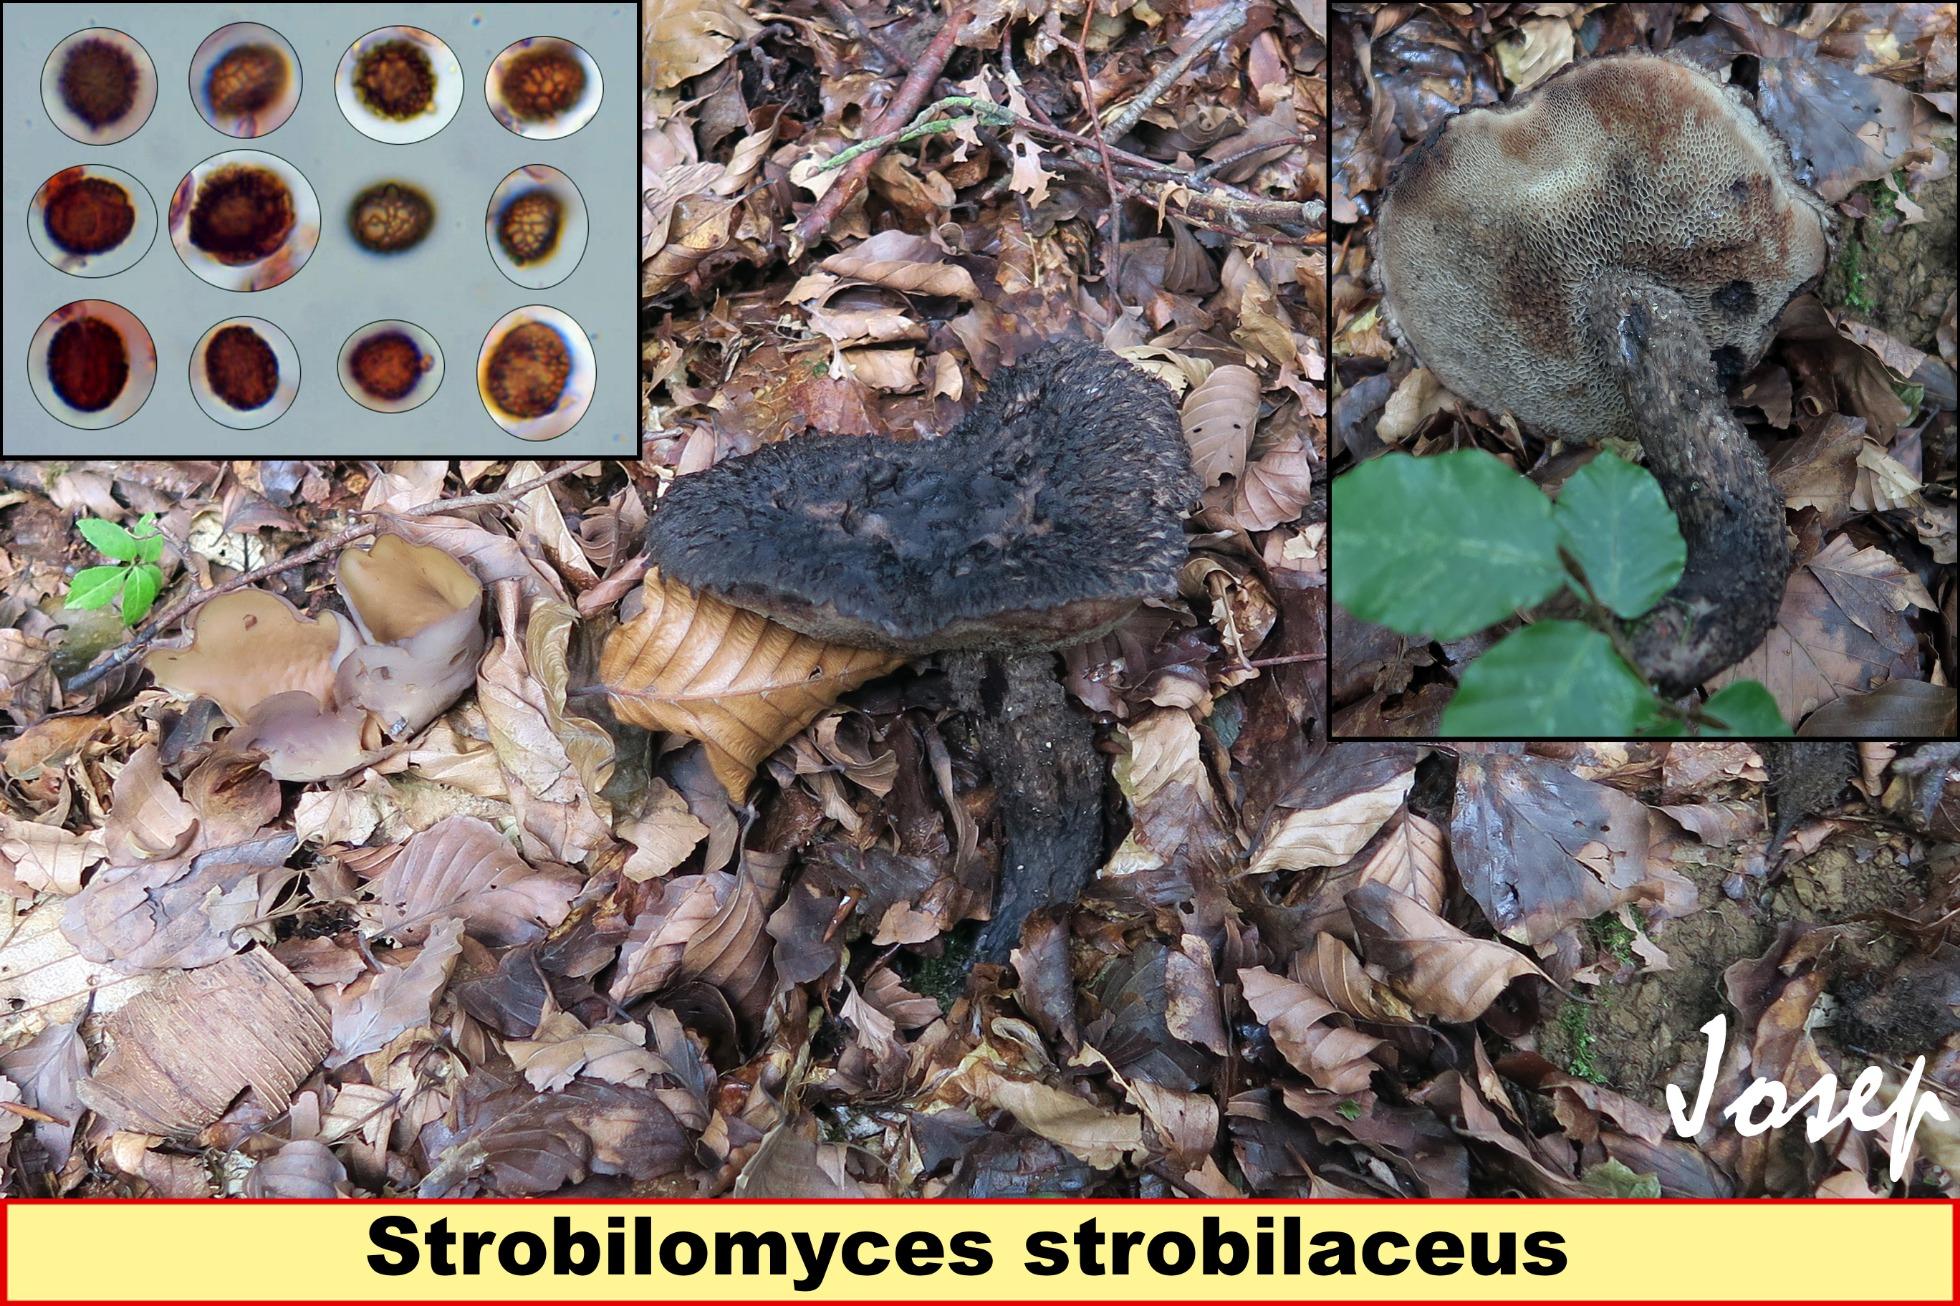 Strobilomycesstrobilaceus_2018-08-12.jpg